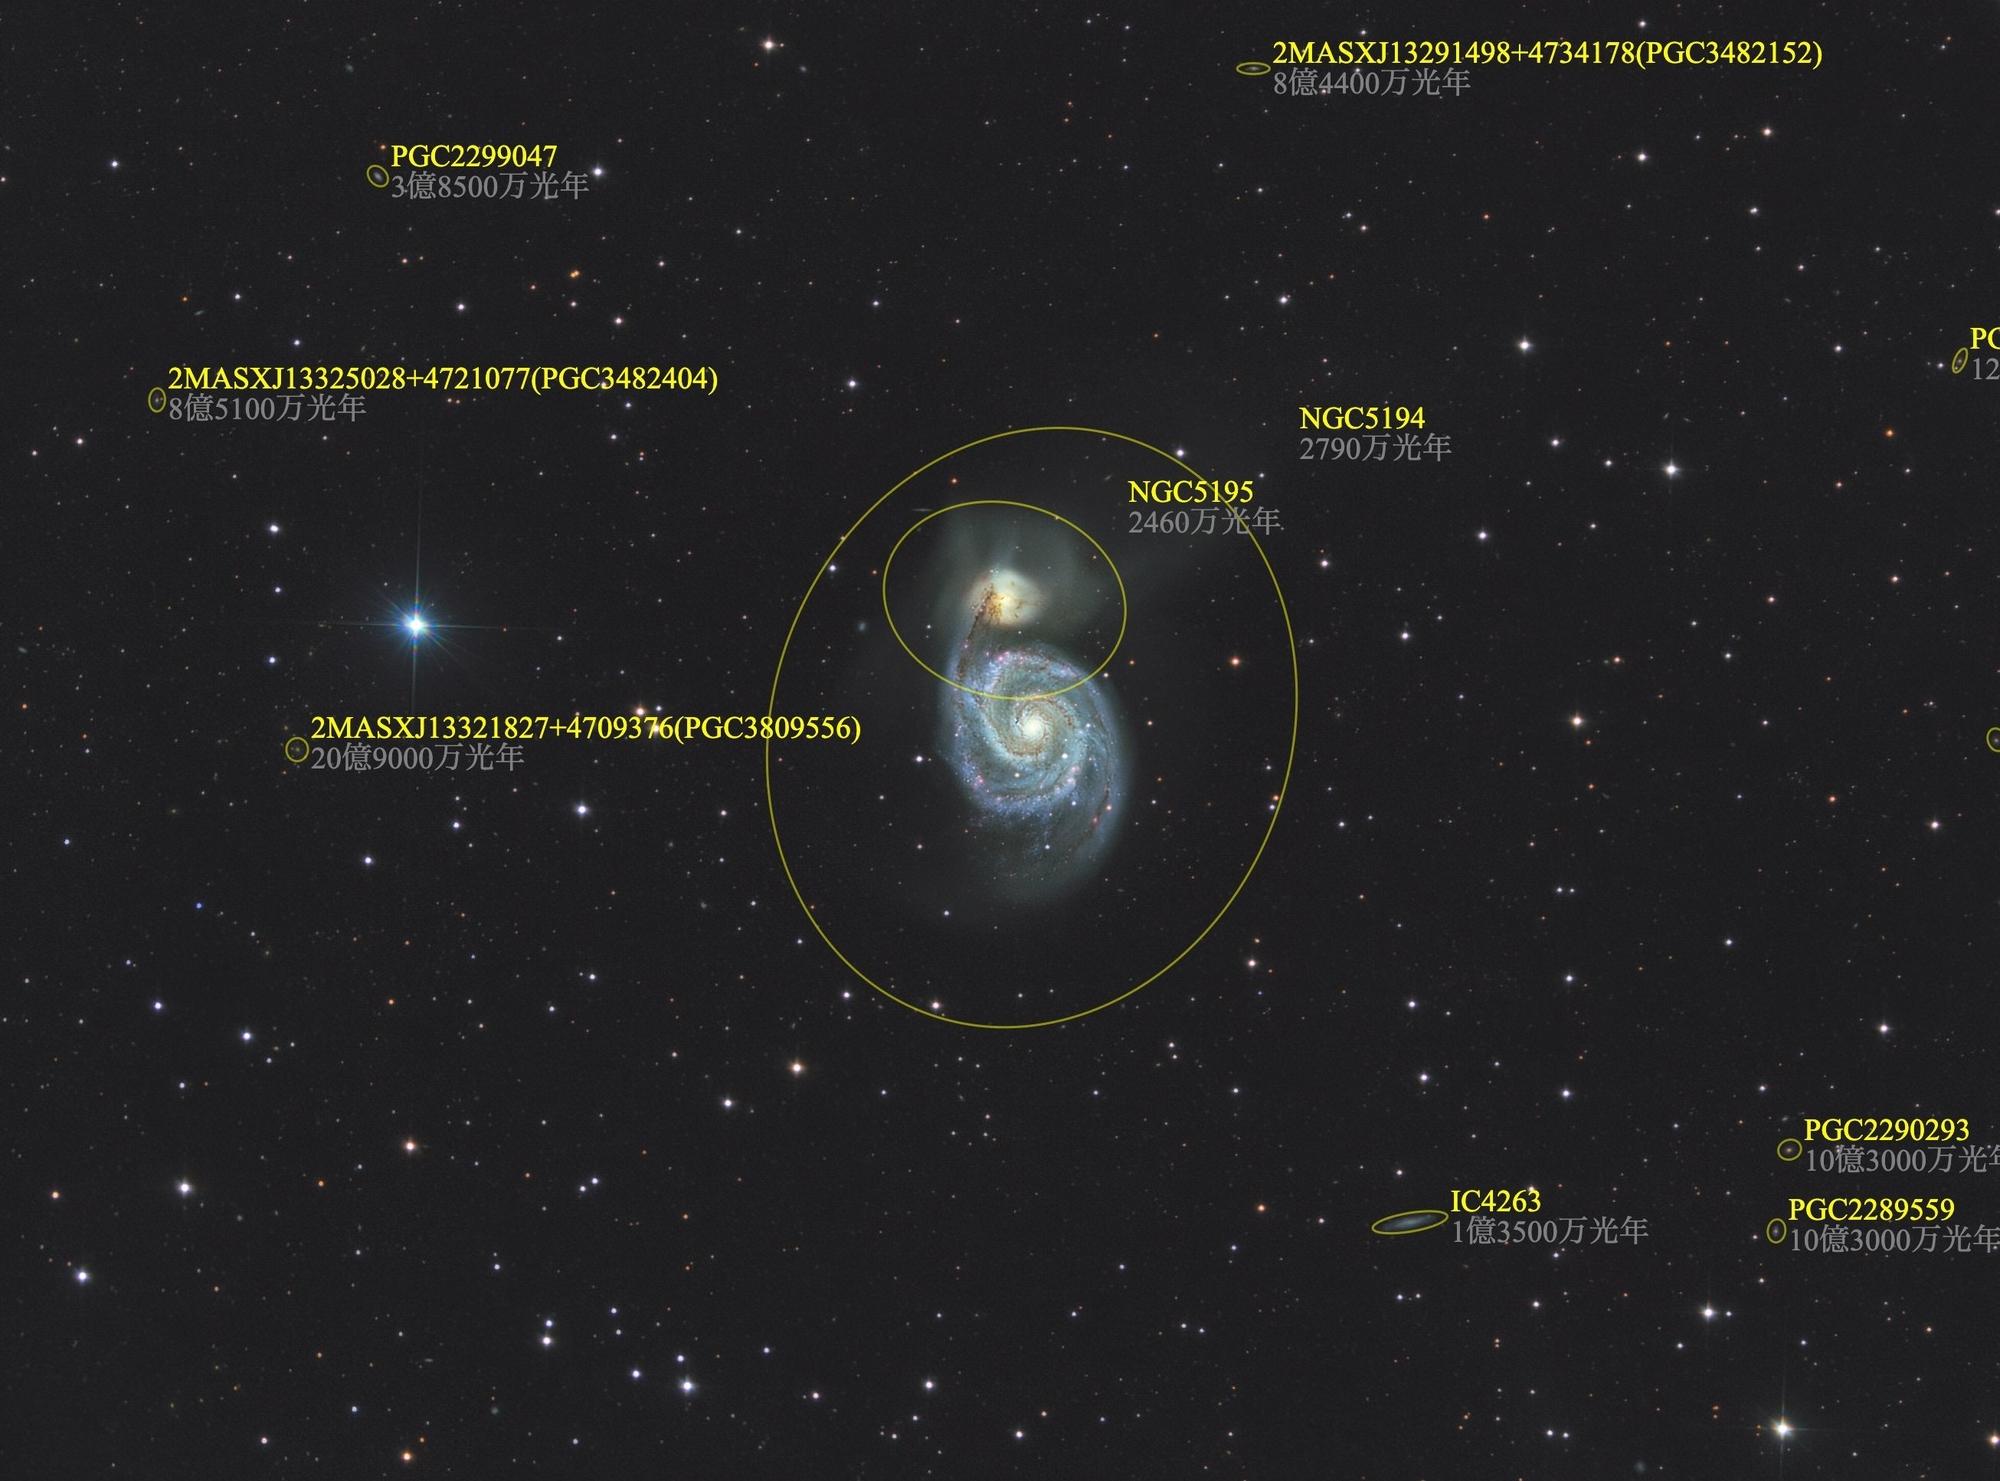 f:id:snct-astro:20210529004350j:plain